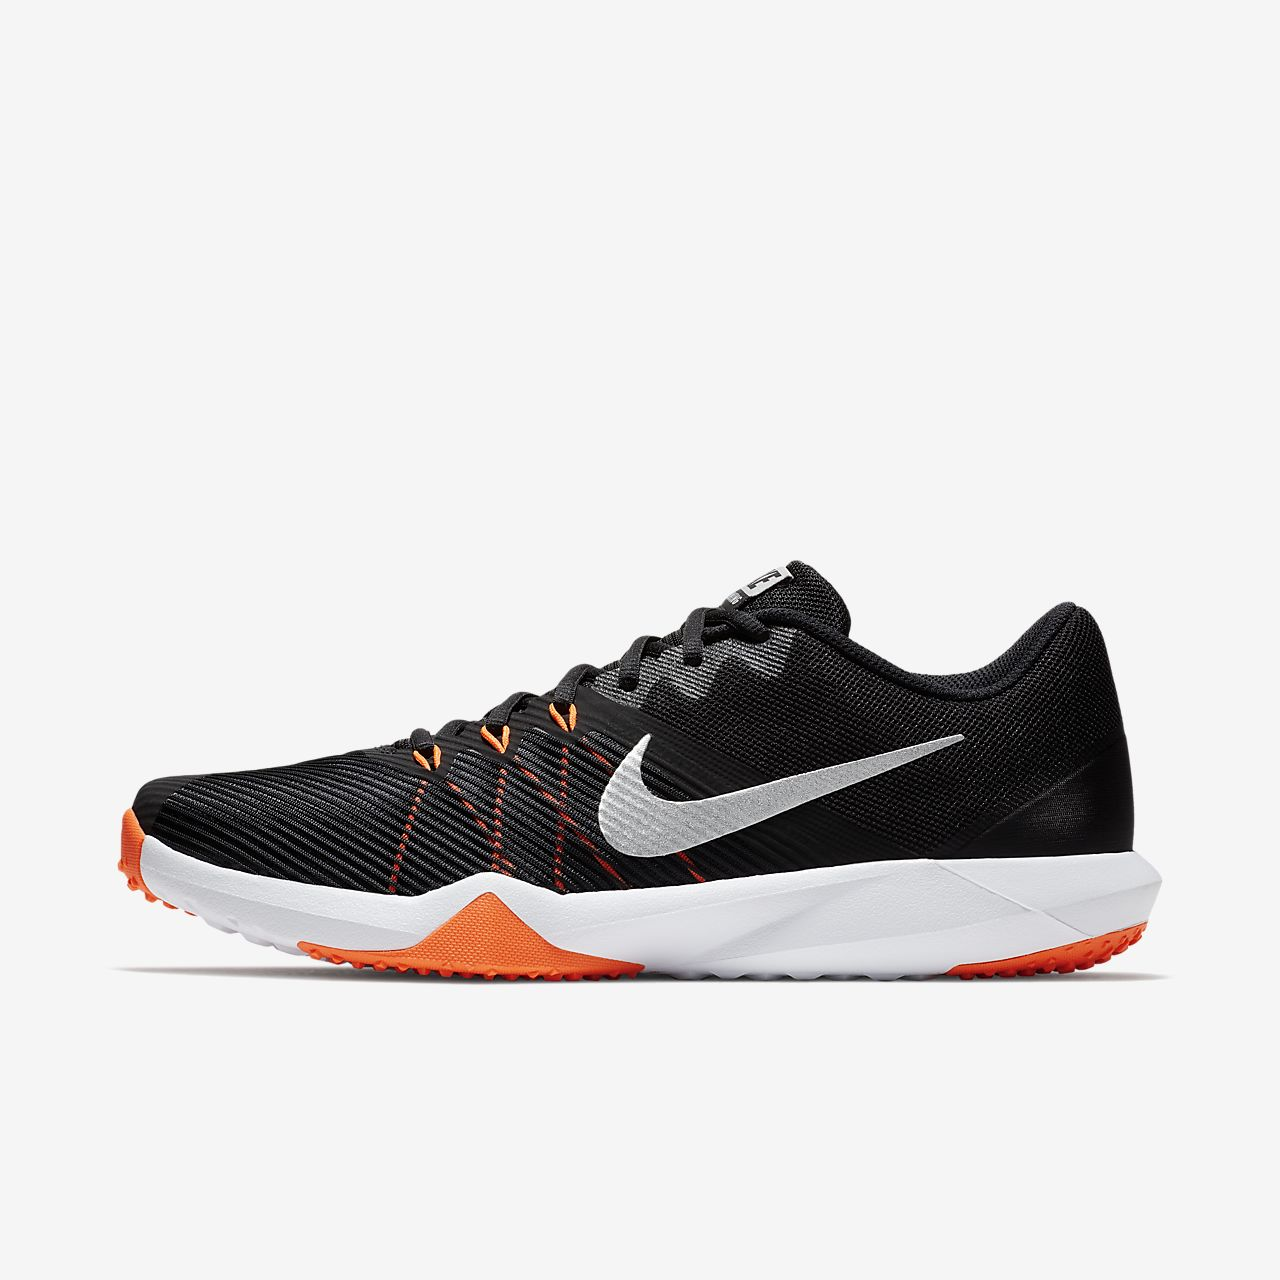 Nike Zoom Fit Training Shoe